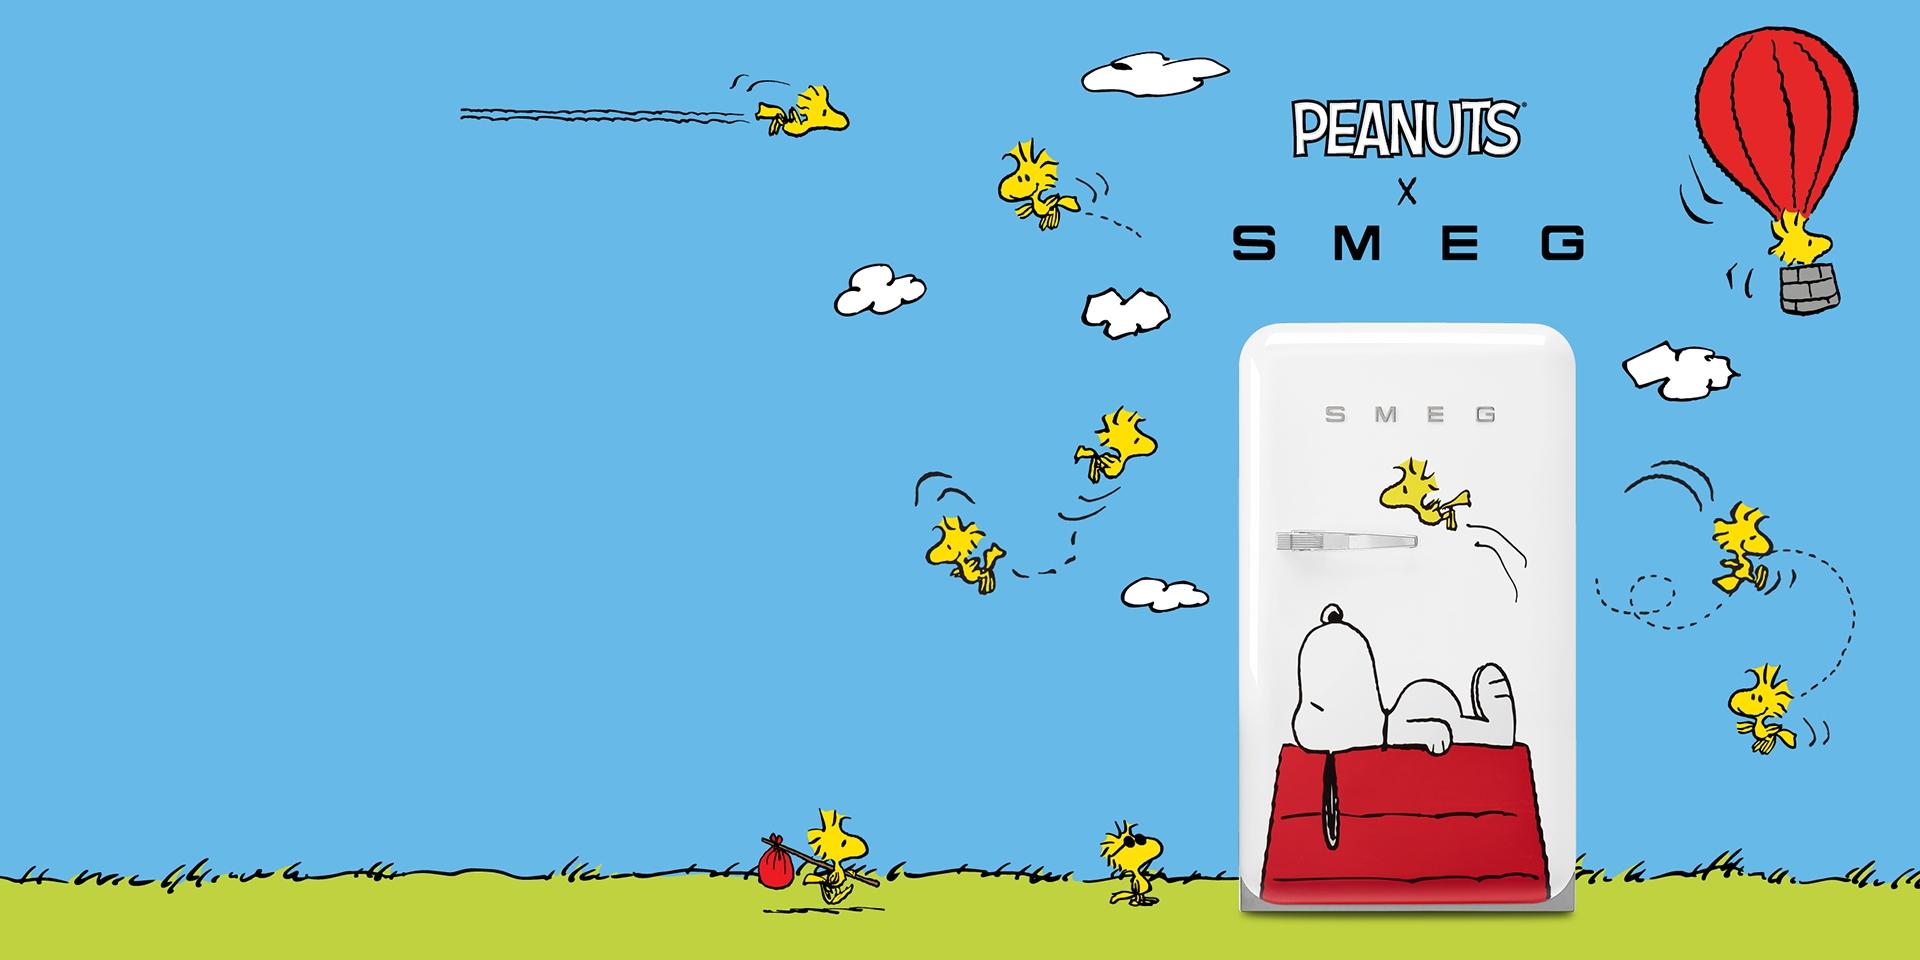 SMEG viert 70e verjaardag Snoopy